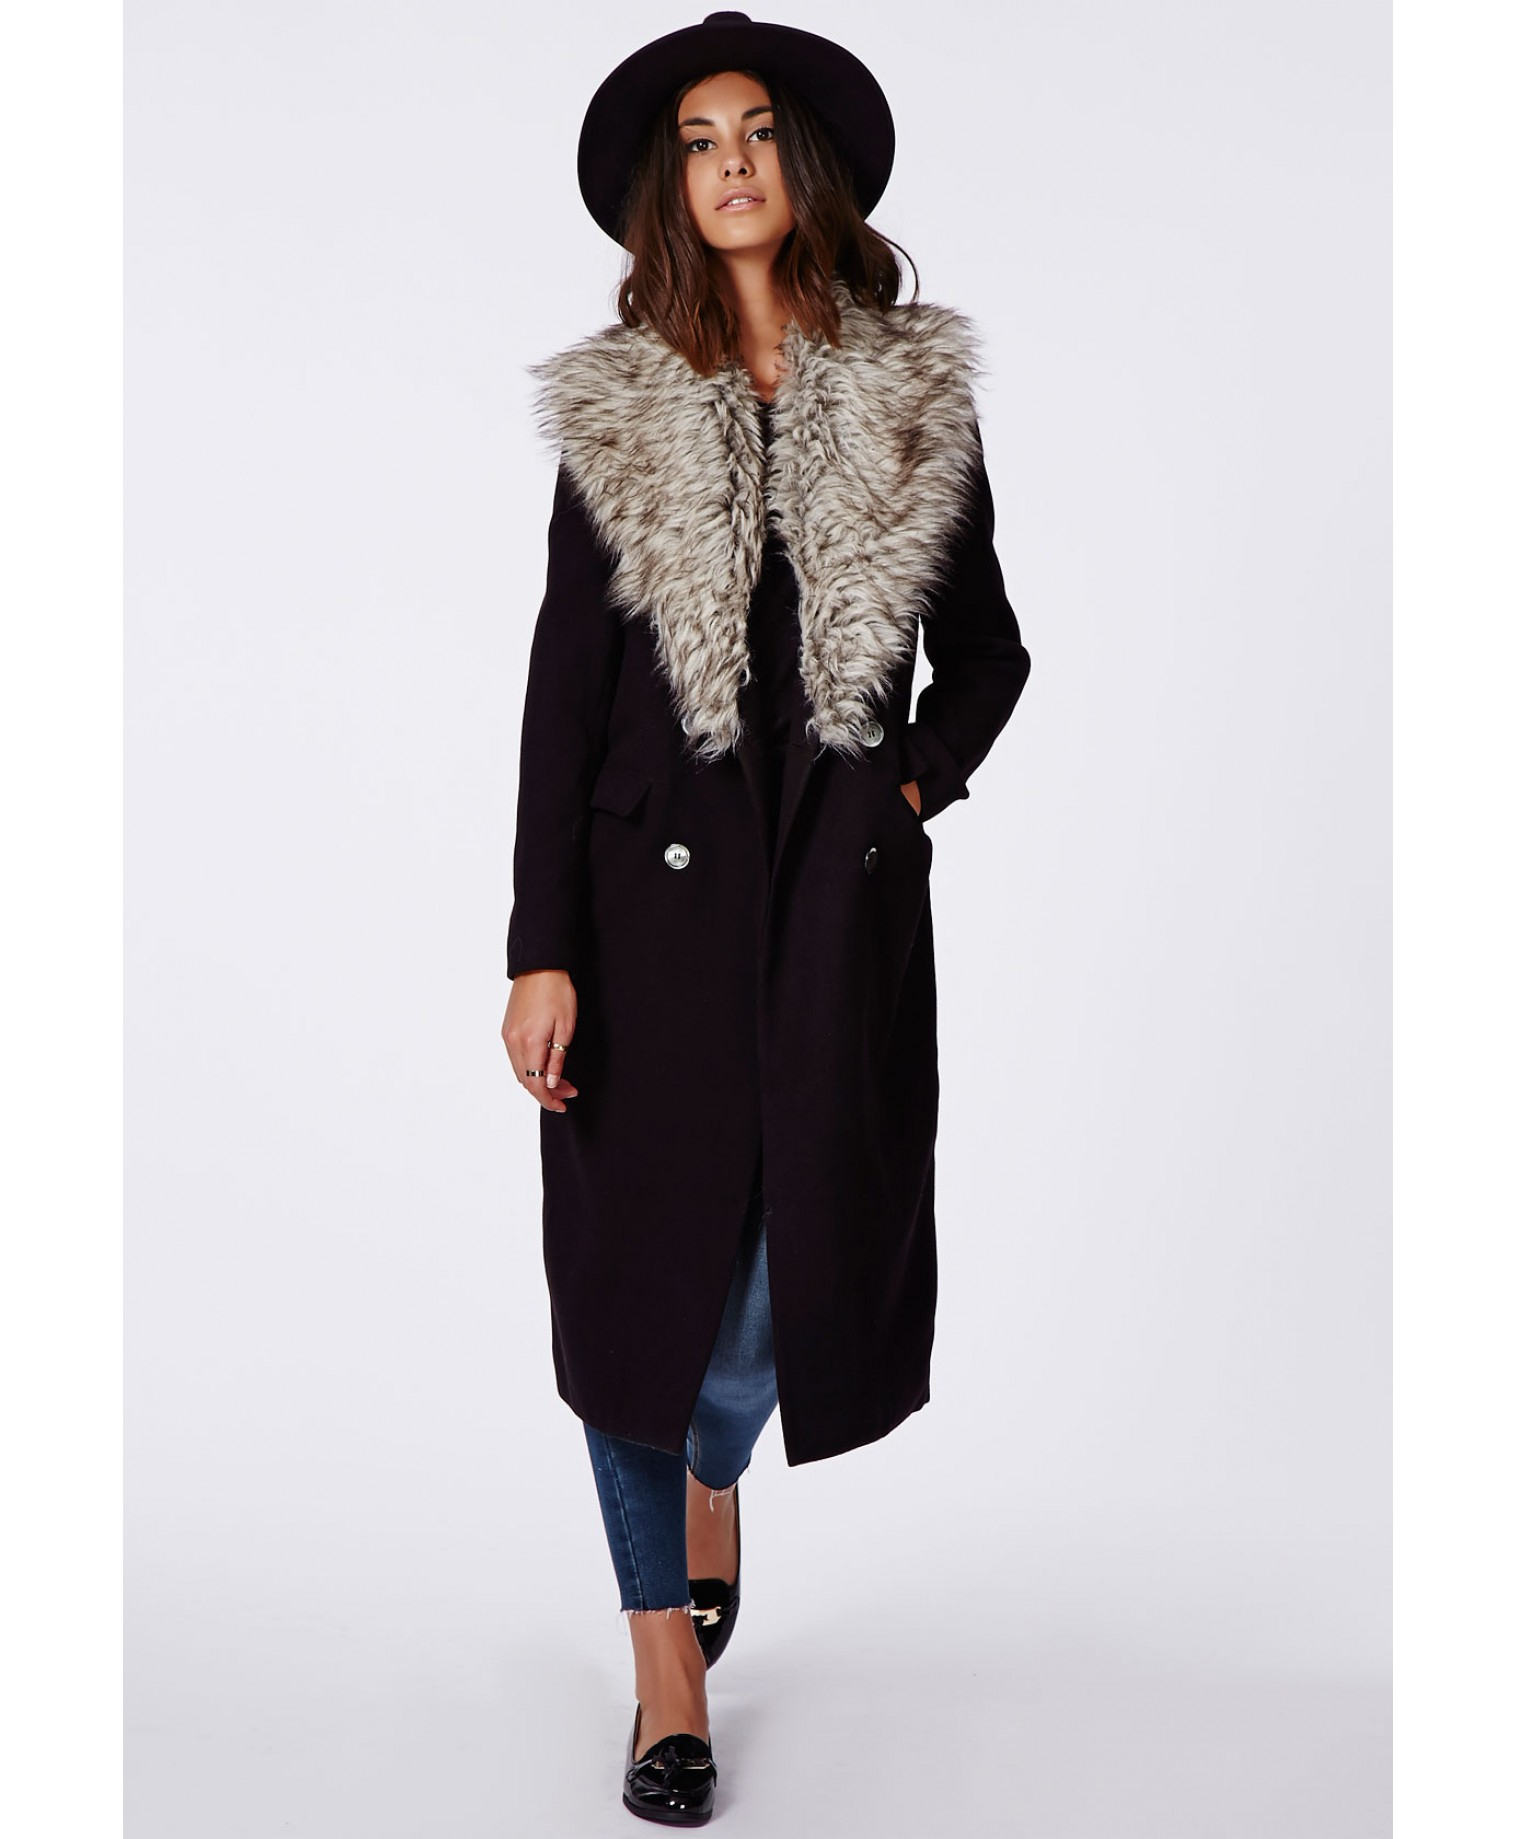 a203f1e7cec8 Missguided Amalie Faux Fur Collar Wool Coat Black in Black - Lyst